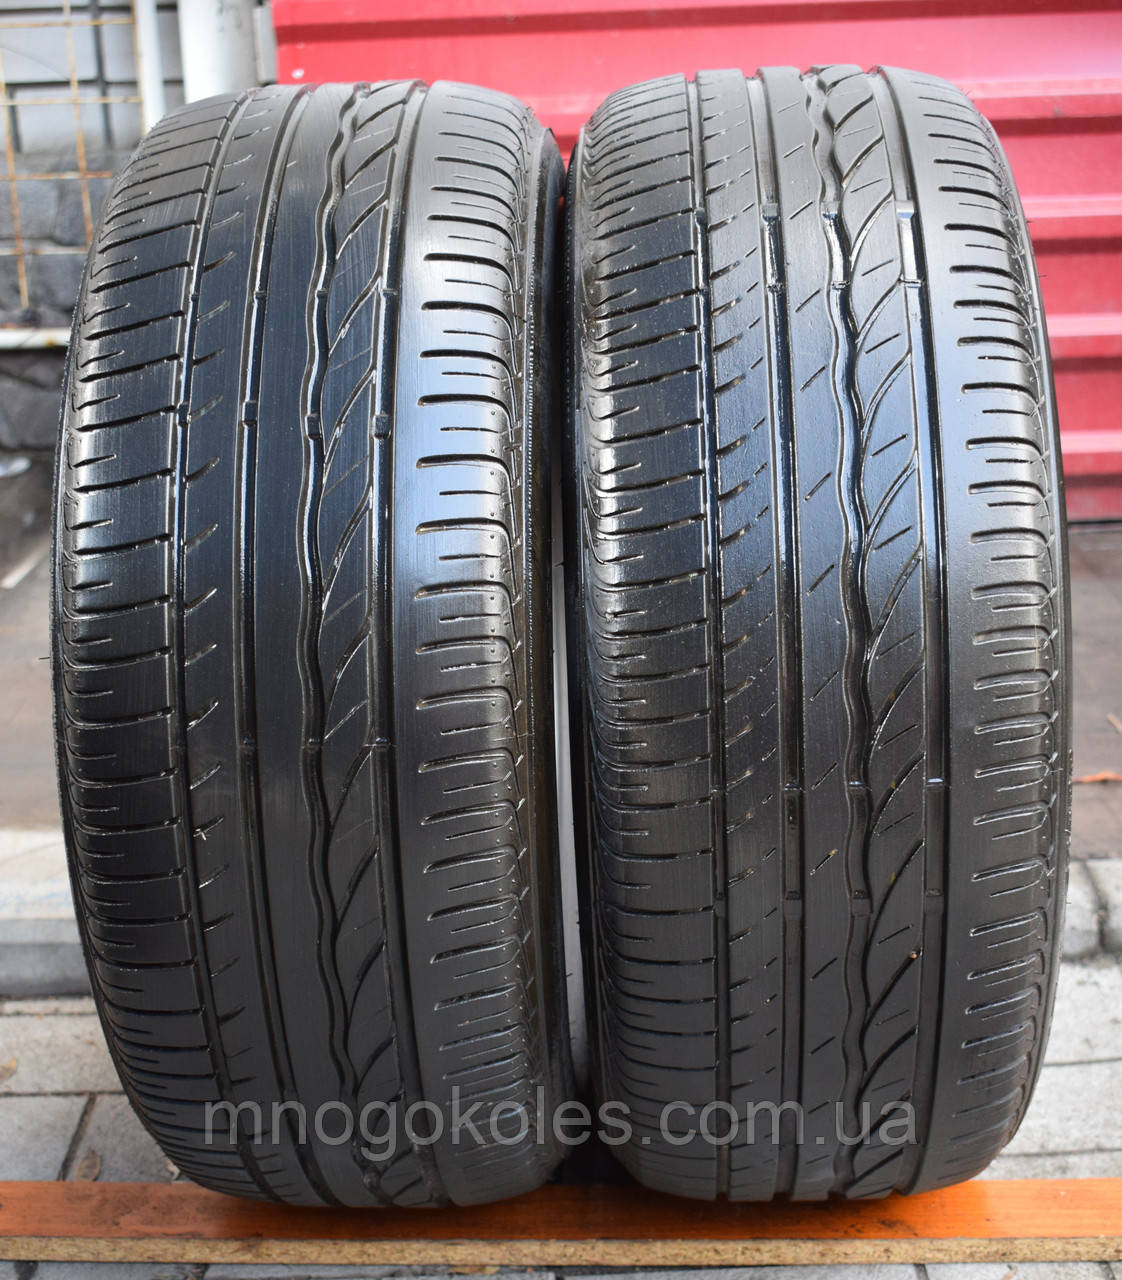 Шины б/у 205/55 R16 Bridgestone Turanza ER300, ЛЕТО, 6 мм, 2015 г., пара